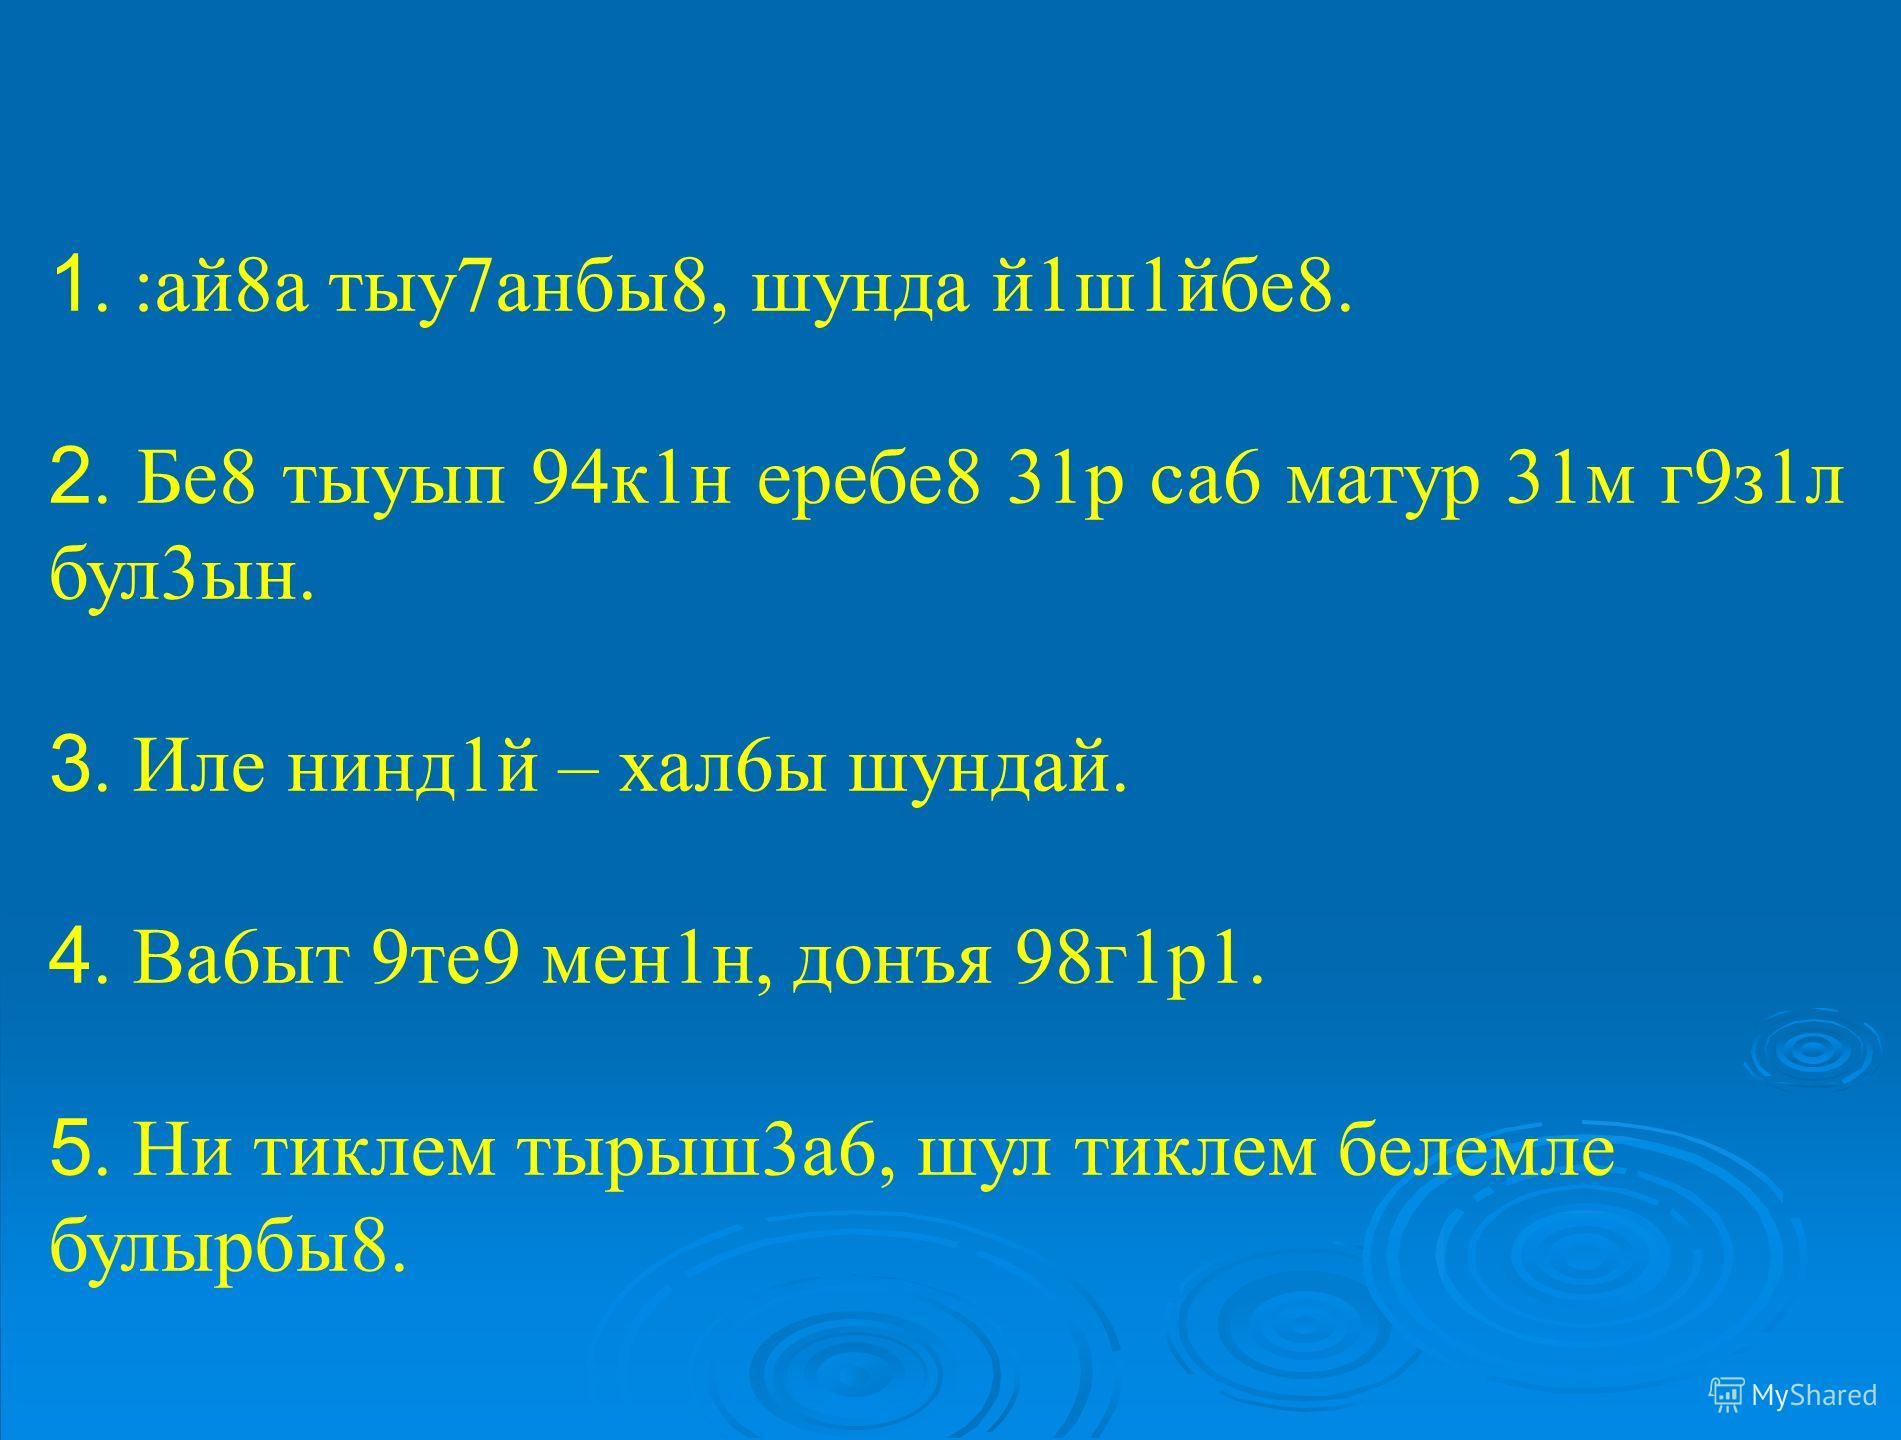 1. :ай8а тыу7анбы8, шунда й1ш1йбе8. 2. Бе8 тыуып 94к1н еребе8 31р са6 матур 31м г9з1л бул3ын. 3. Иле нинд1й – хал6ы шундай. 4. Ва6ыт 9те9 мен1н, донъя 98г1р1. 5. Ни тиклем тырыш3а6, шул тиклем белемле булырбы8.